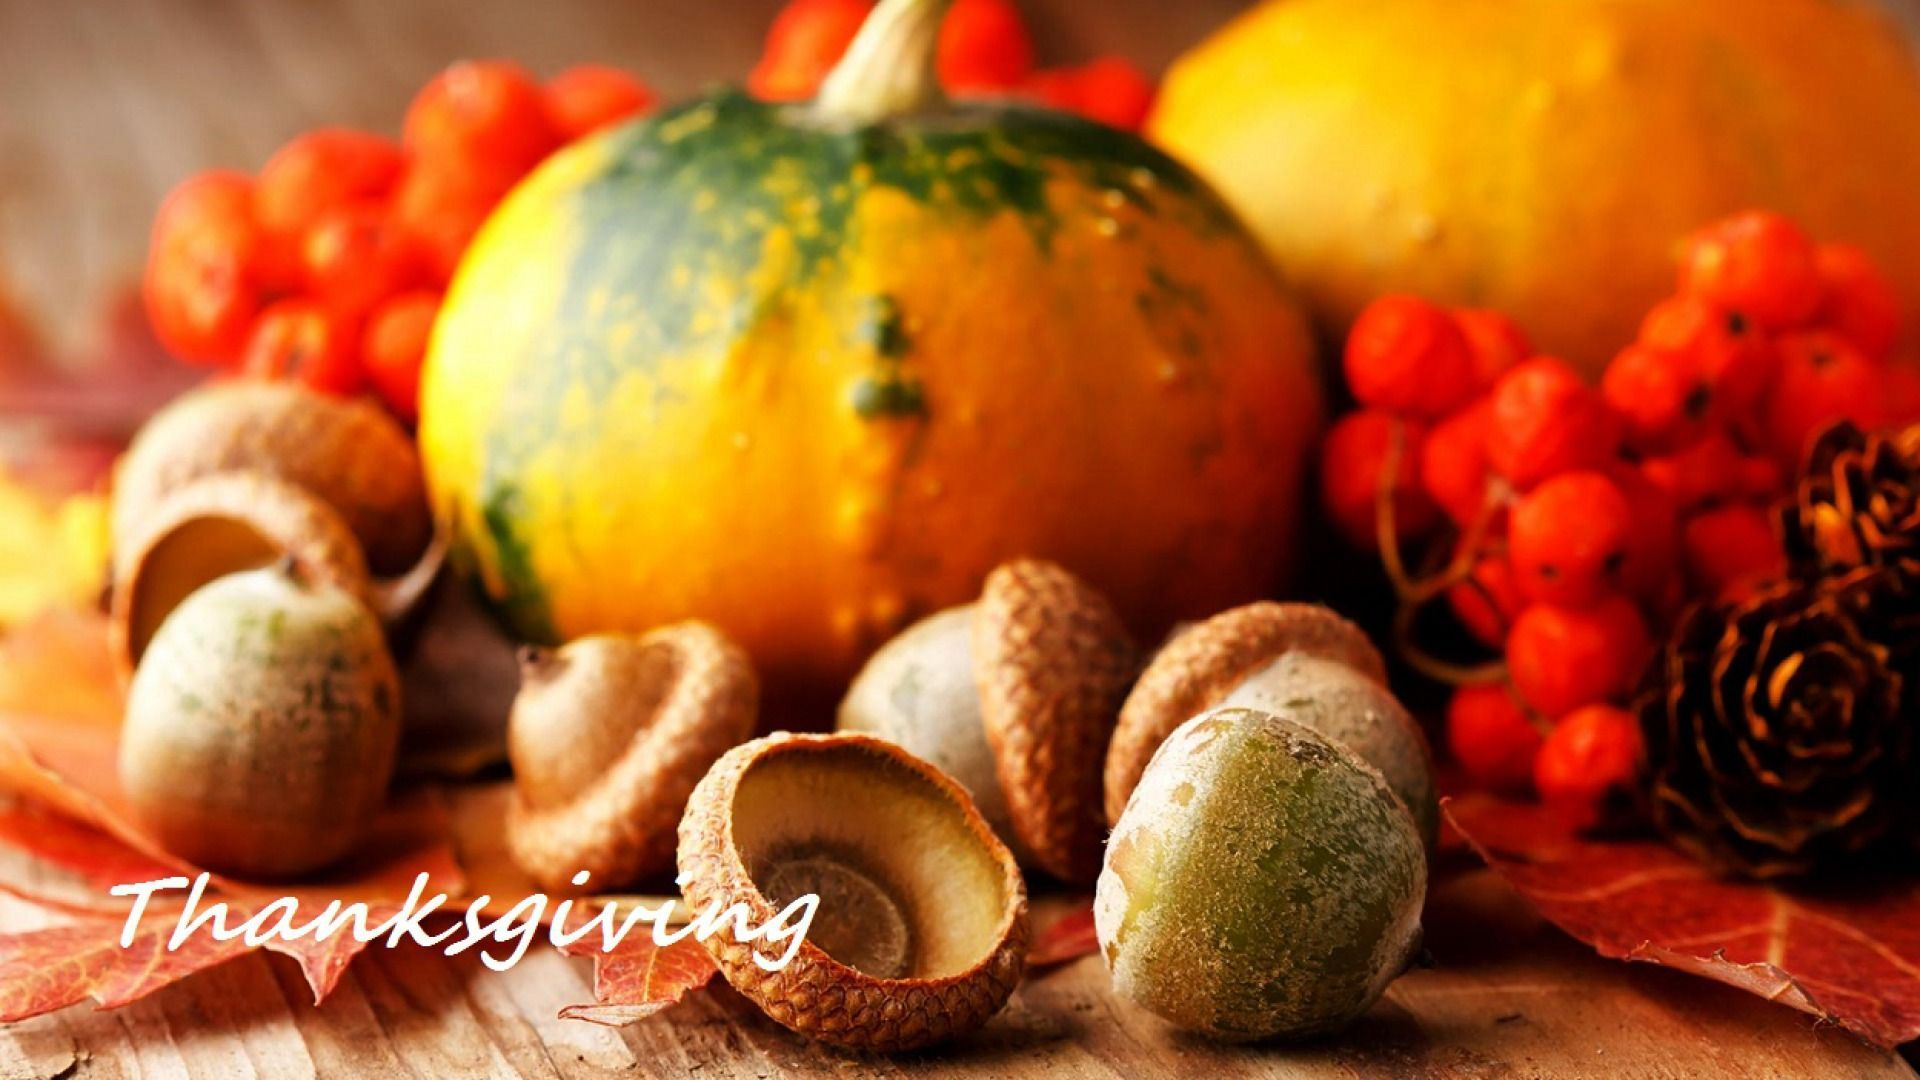 Thanksgiving Screensavers